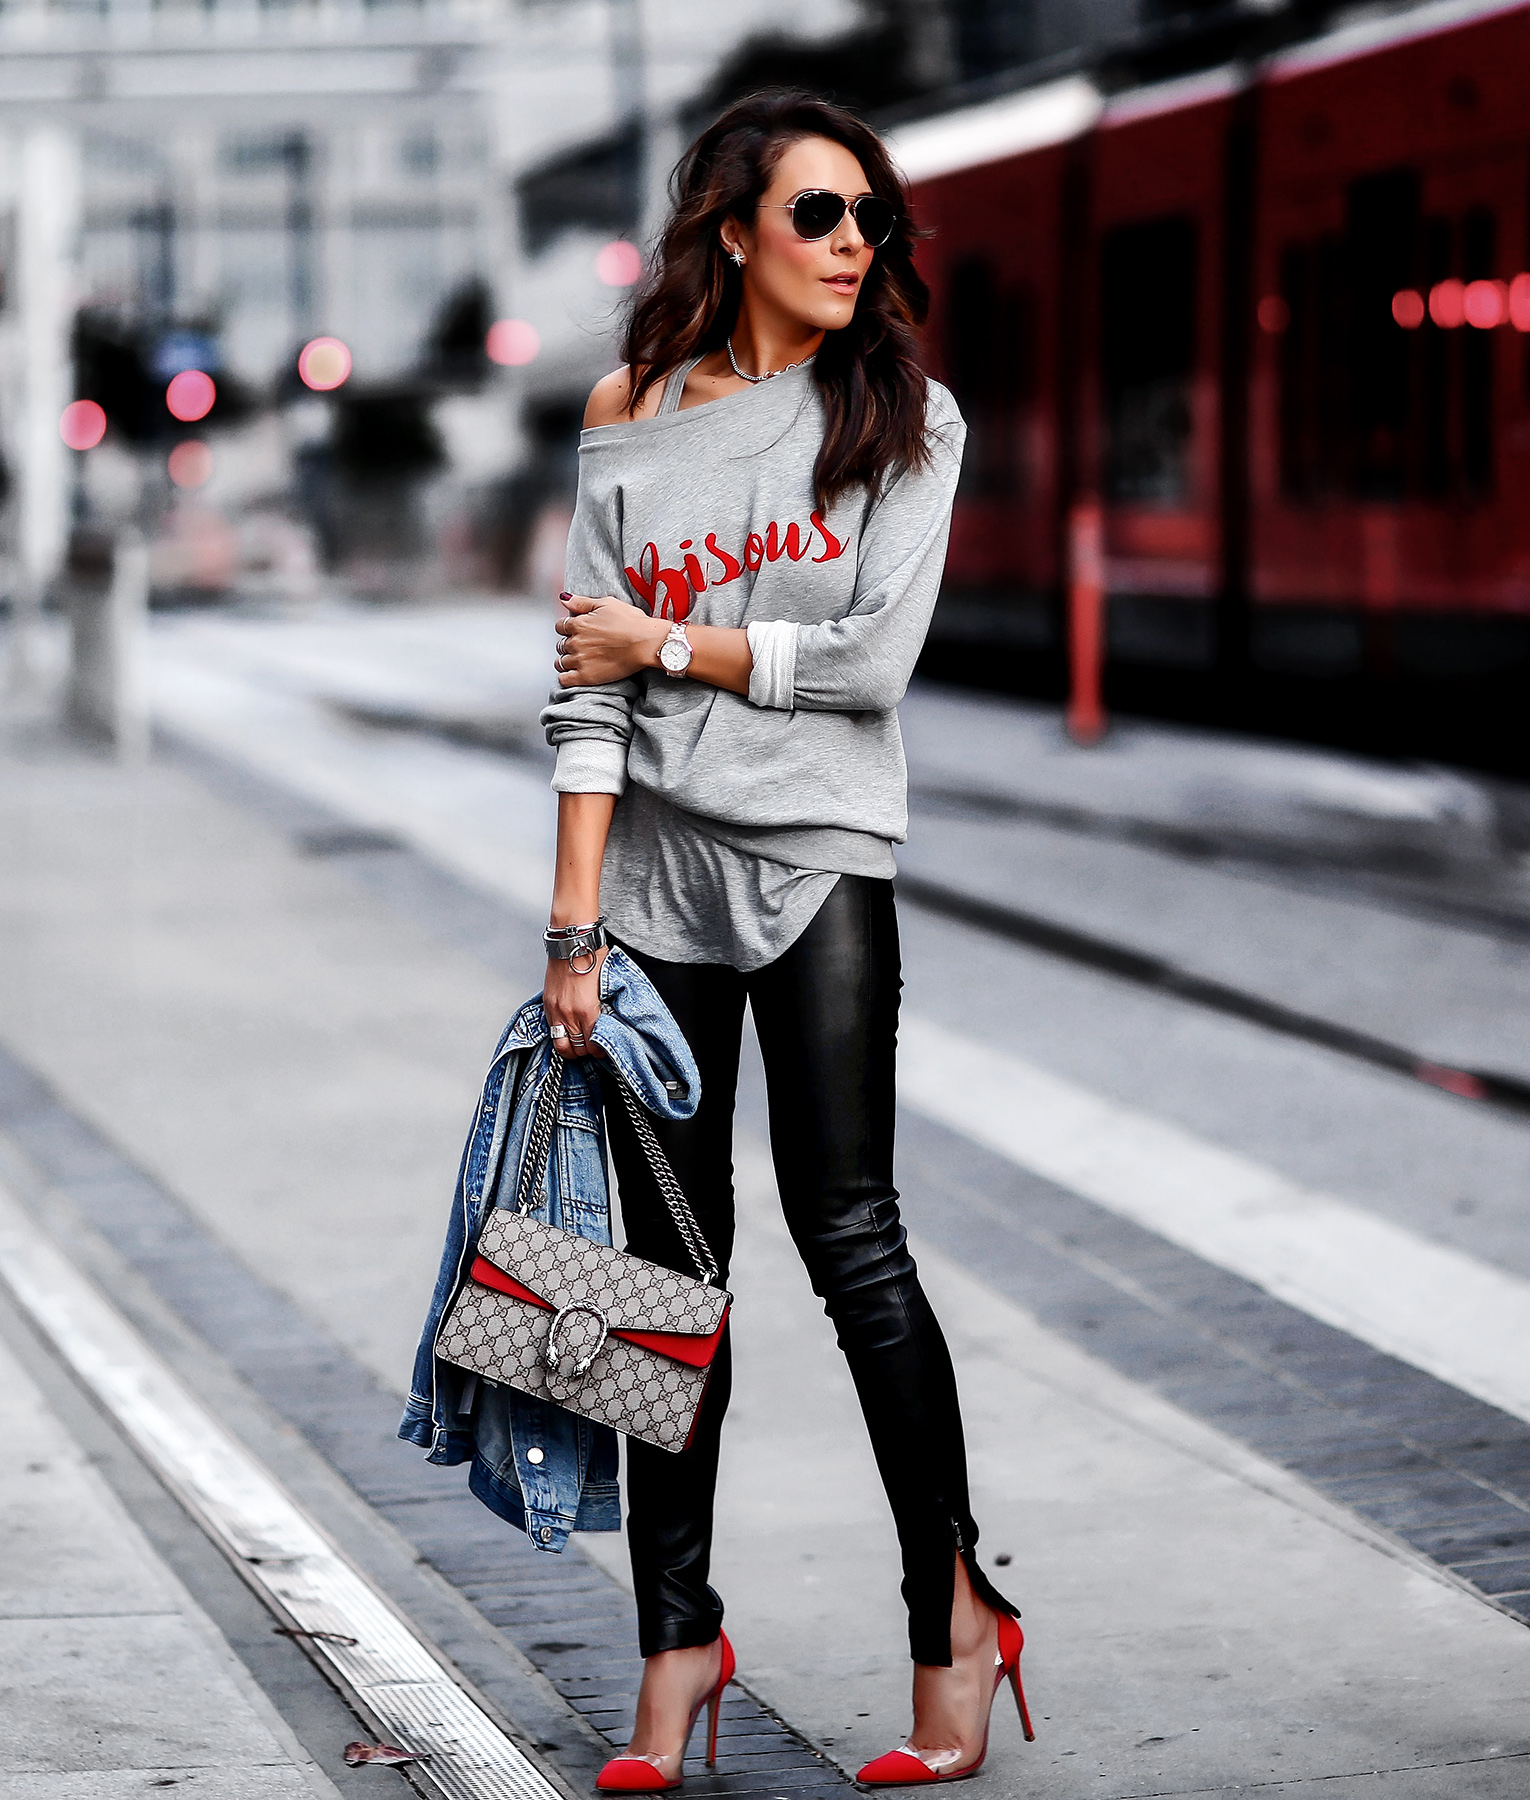 South Parade Bisous Sweatshirt Leather Skinny Pants Gianvito Rossi Plexi Pumps Gucci Dionysus Bag.jpg